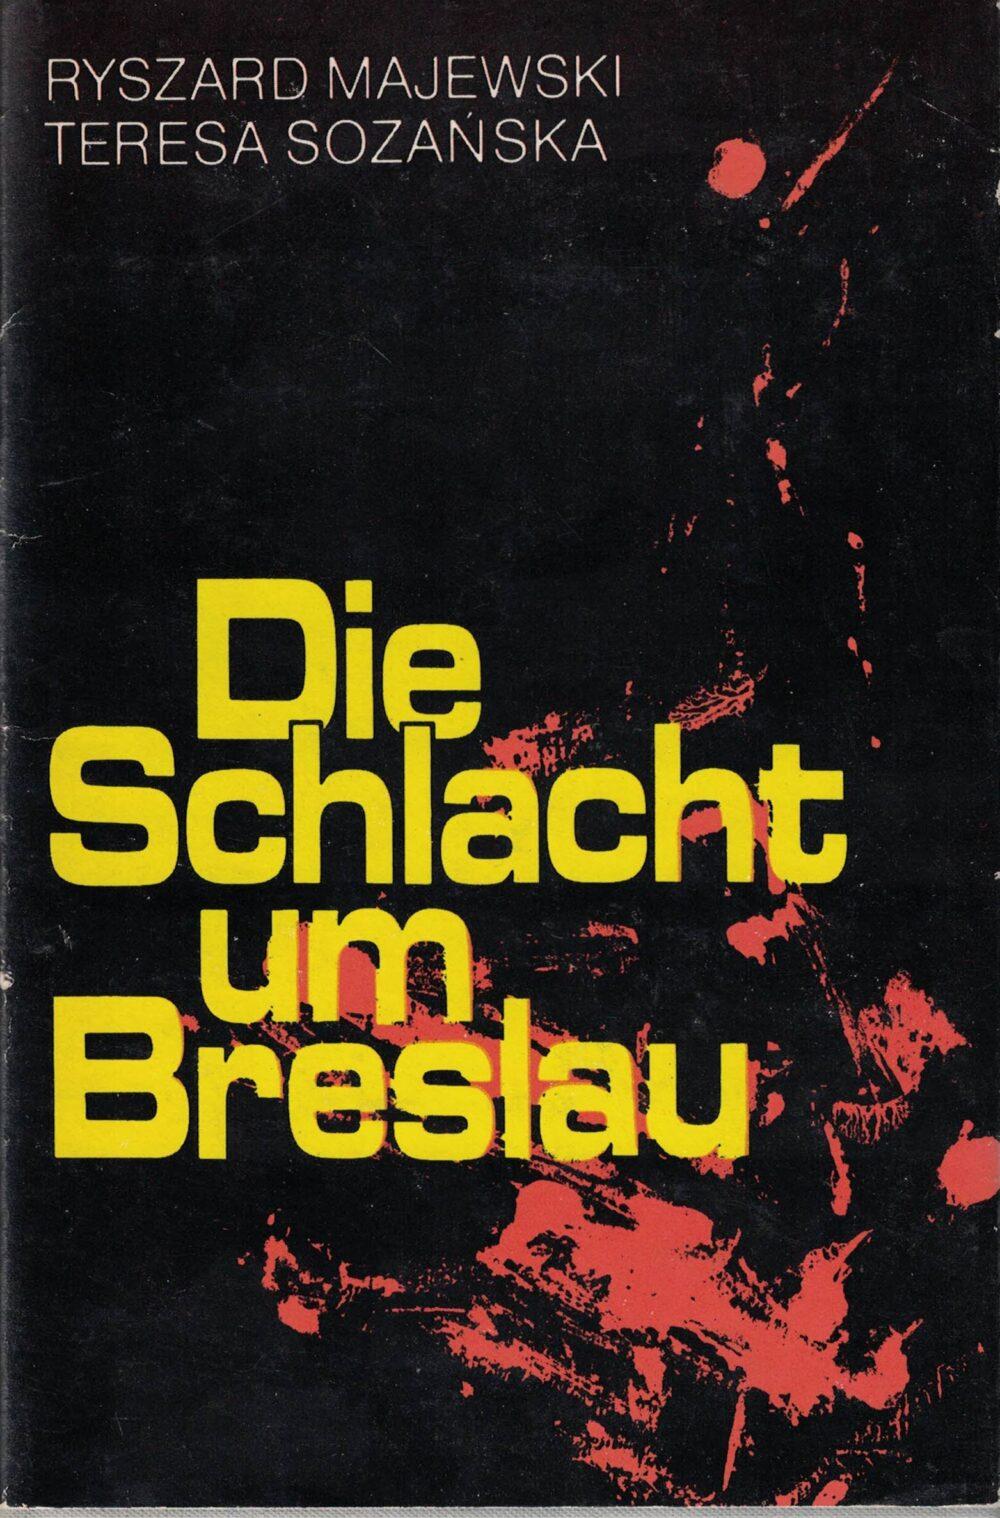 Majewski, Sozanska - Die Schlacht um Breslau Januar bis Mai 1945